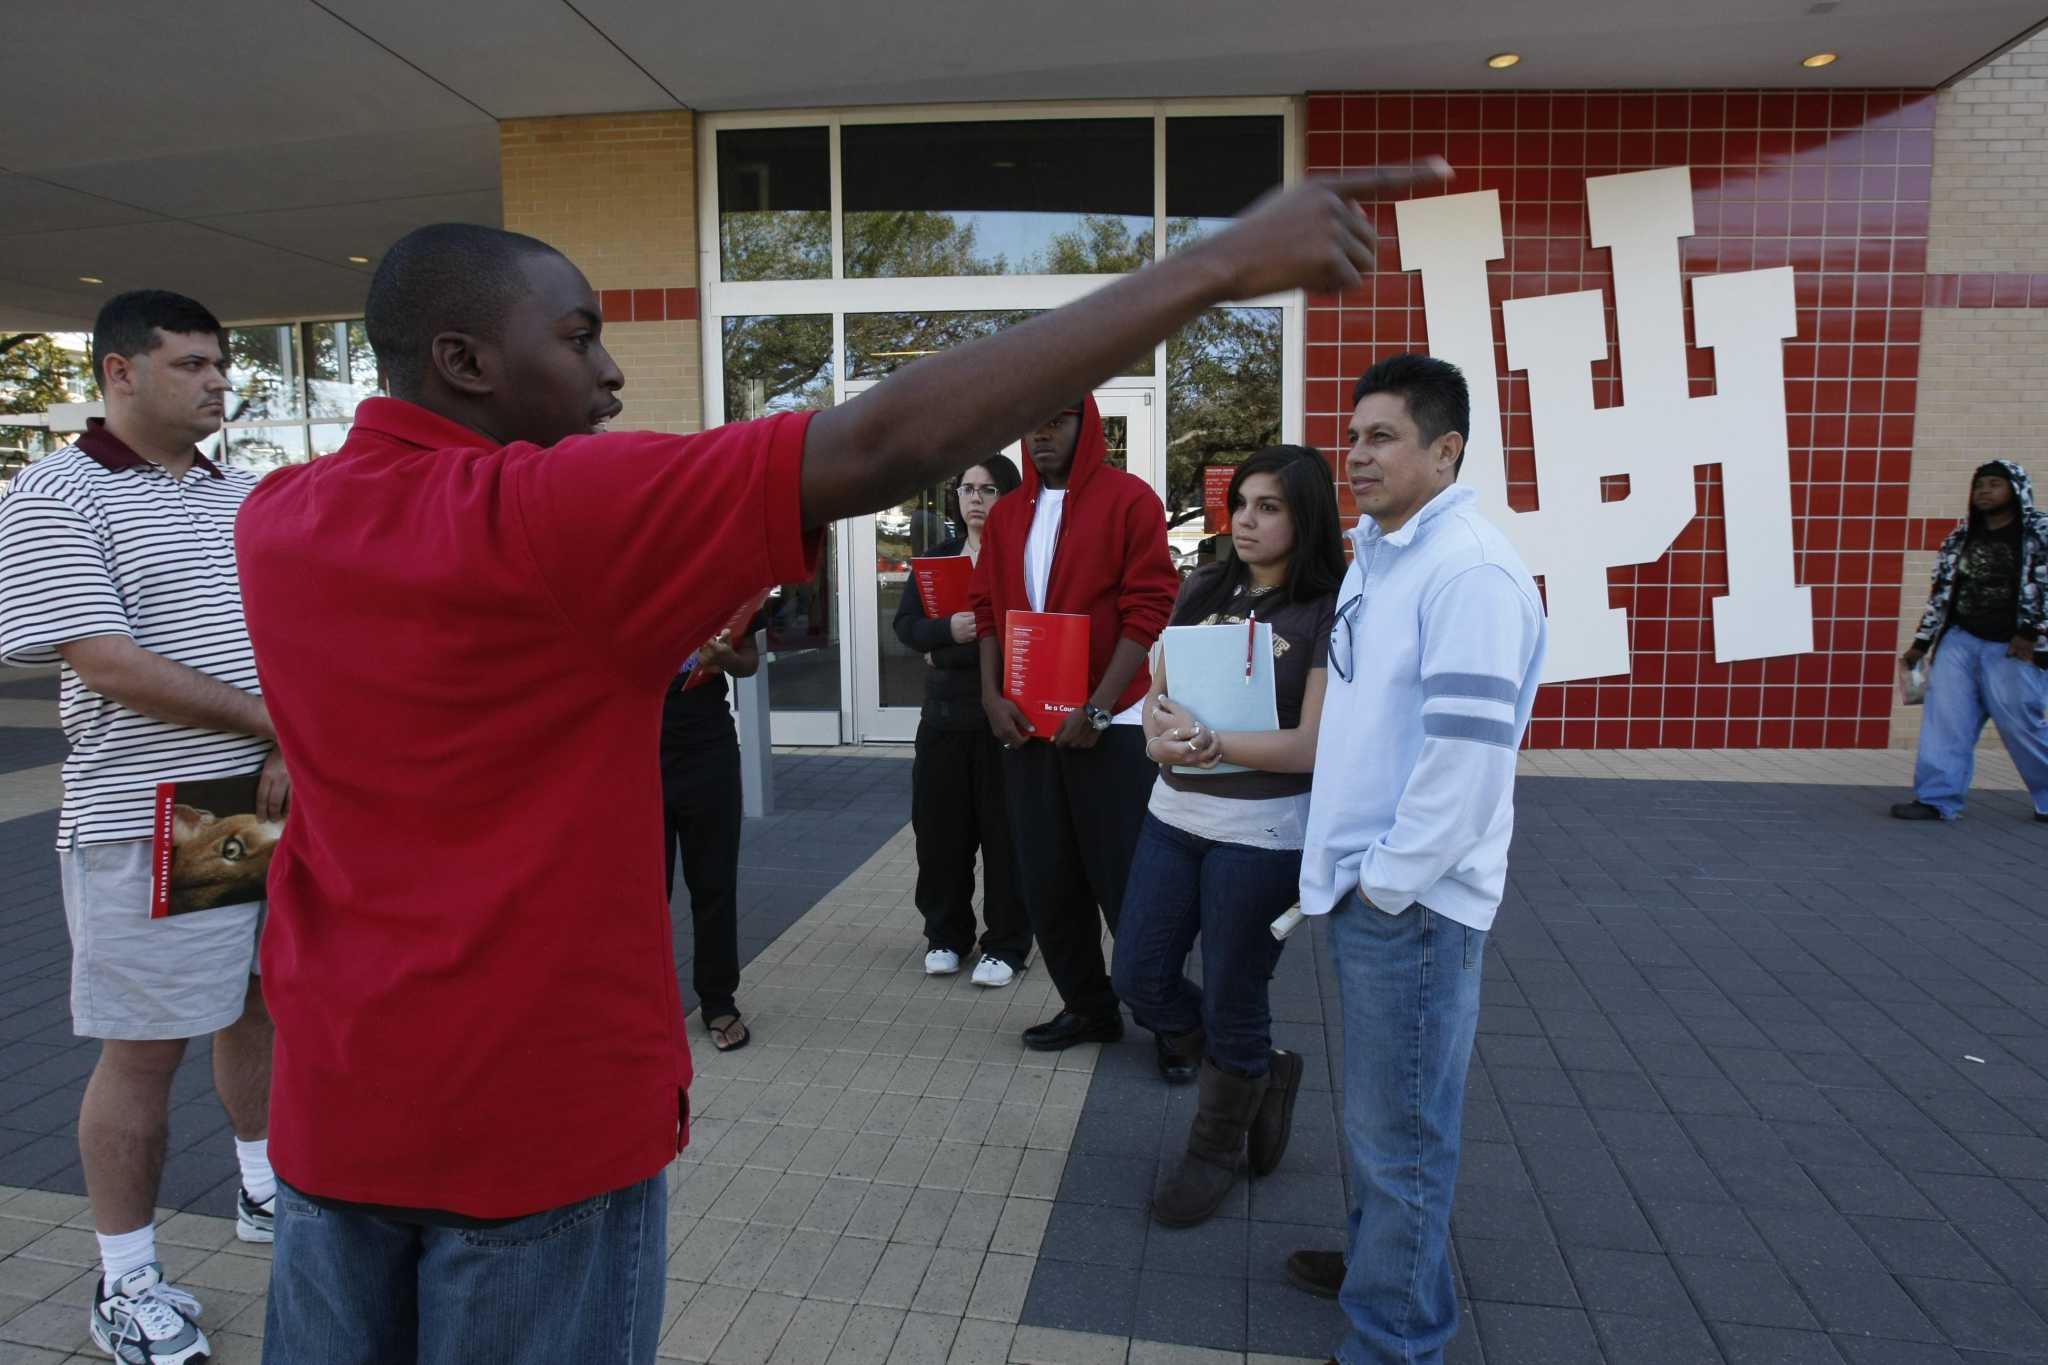 Thumbs: Houston resembles Mexico; Heroic voters; Ice cream lickers